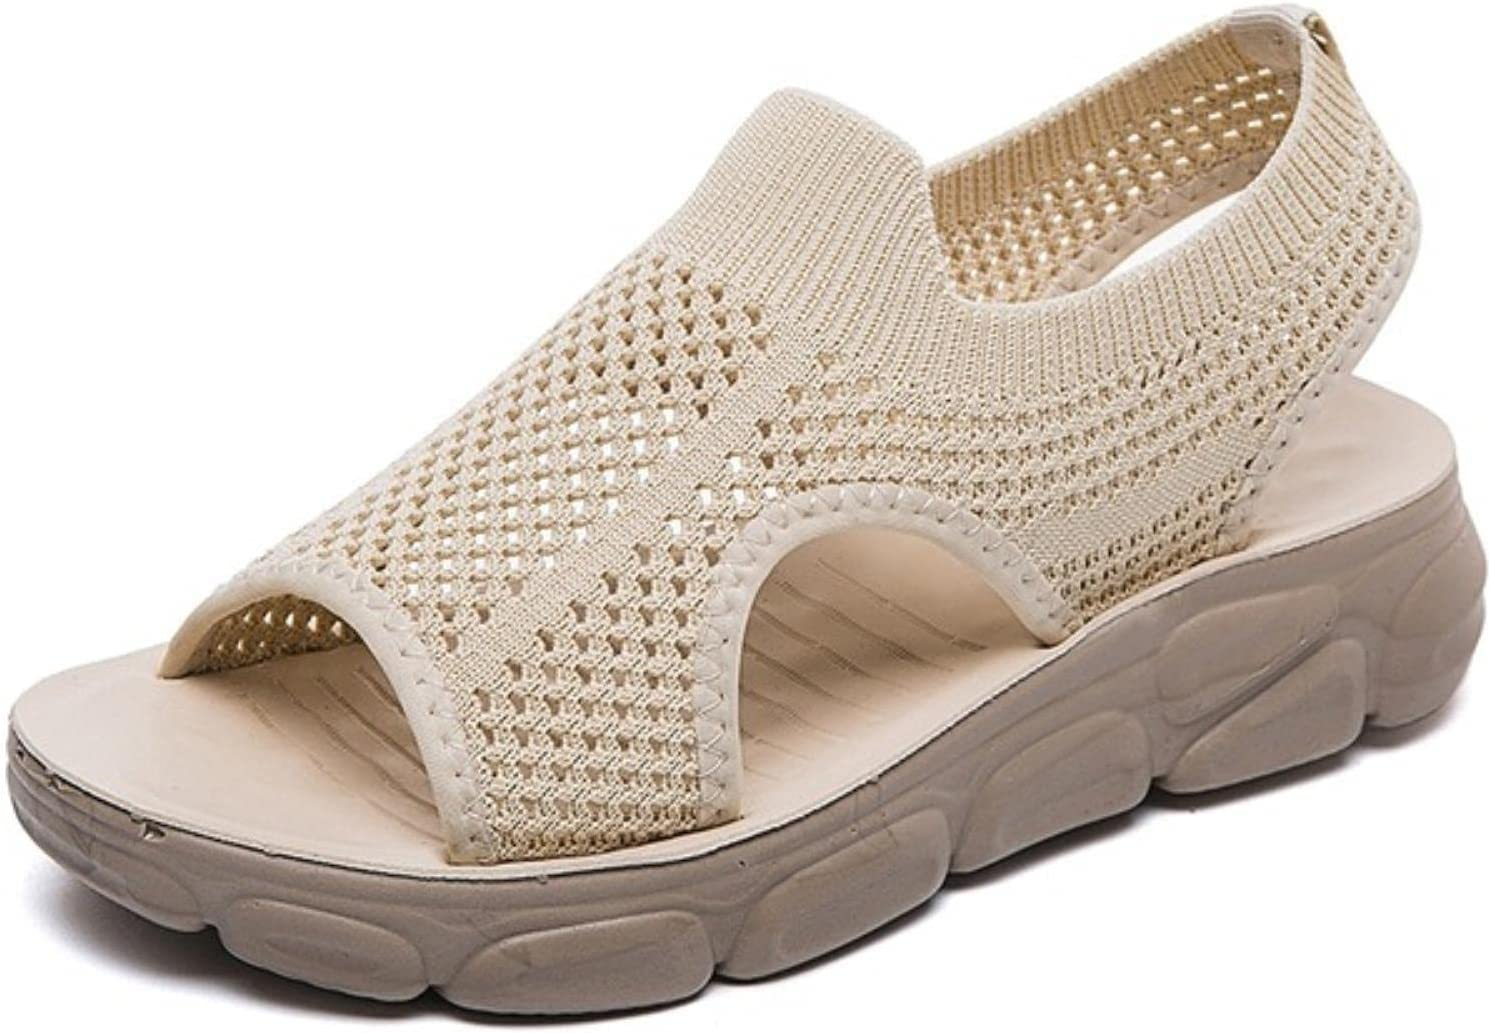 DaVanck In stock Roman Special sale item Sandals Women 2021 Summer Leisu Fashion Breathable